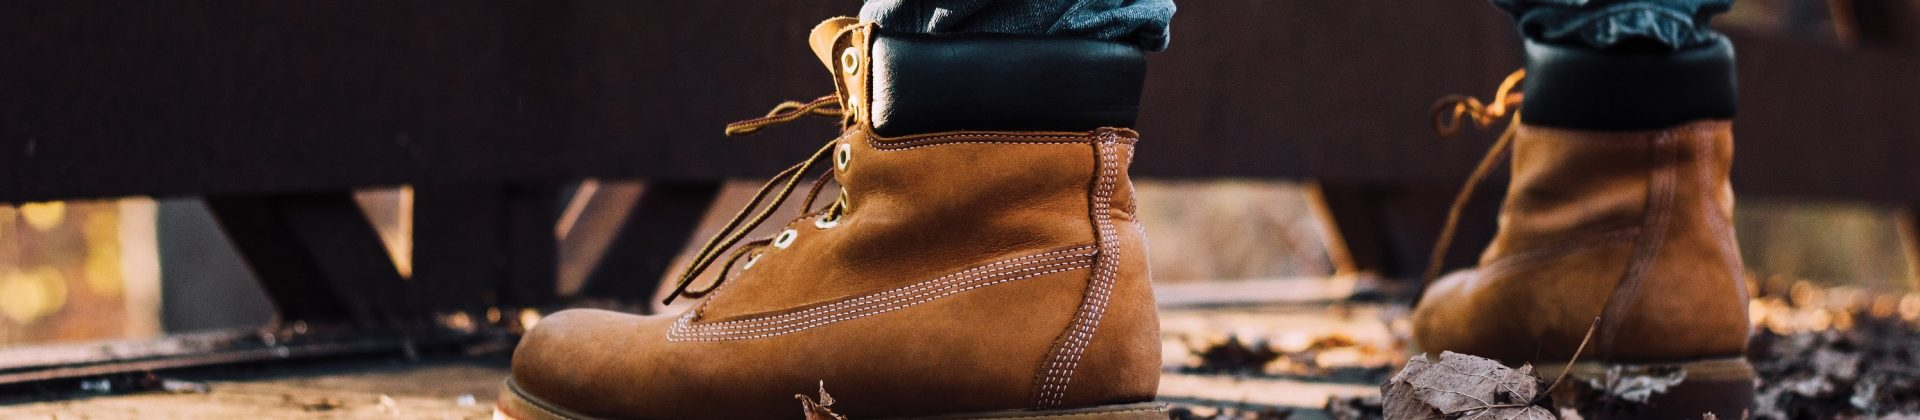 Footlife Steunzolen in werkschoenen